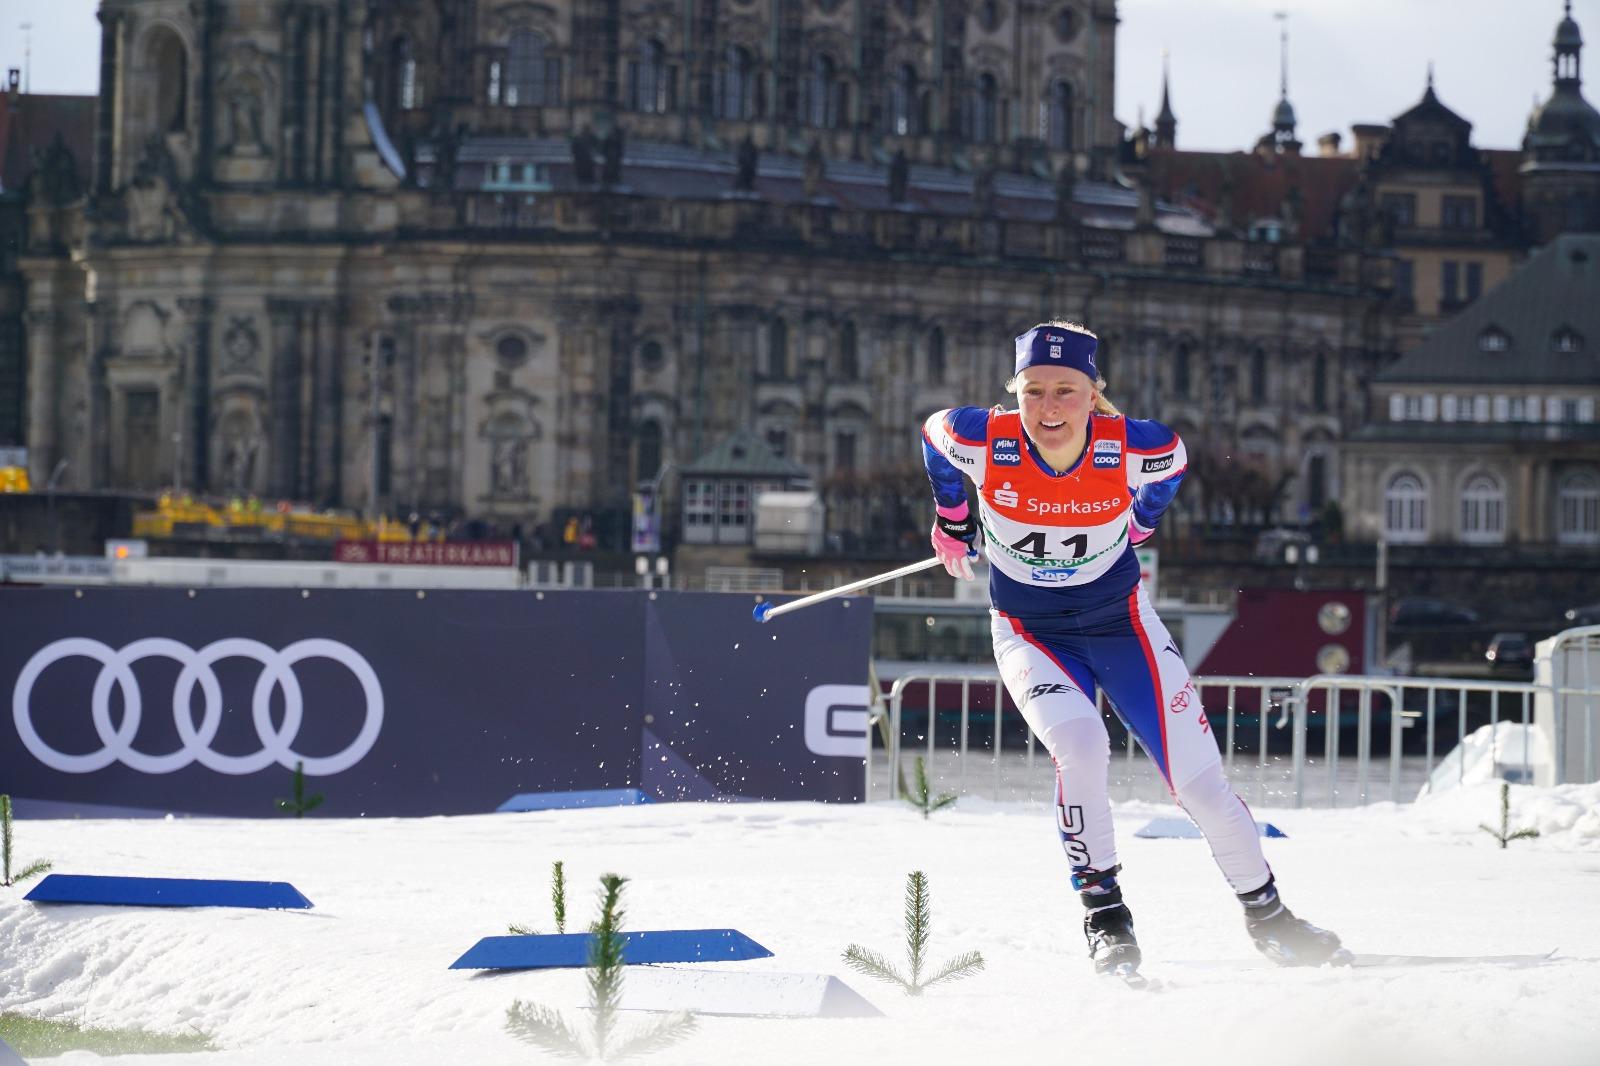 Hannah Halvorsen, class of 2016, racing on the World Cup in Dresden Germany. Photo credit: Garrott Kuzzy  lumiexperiences.com